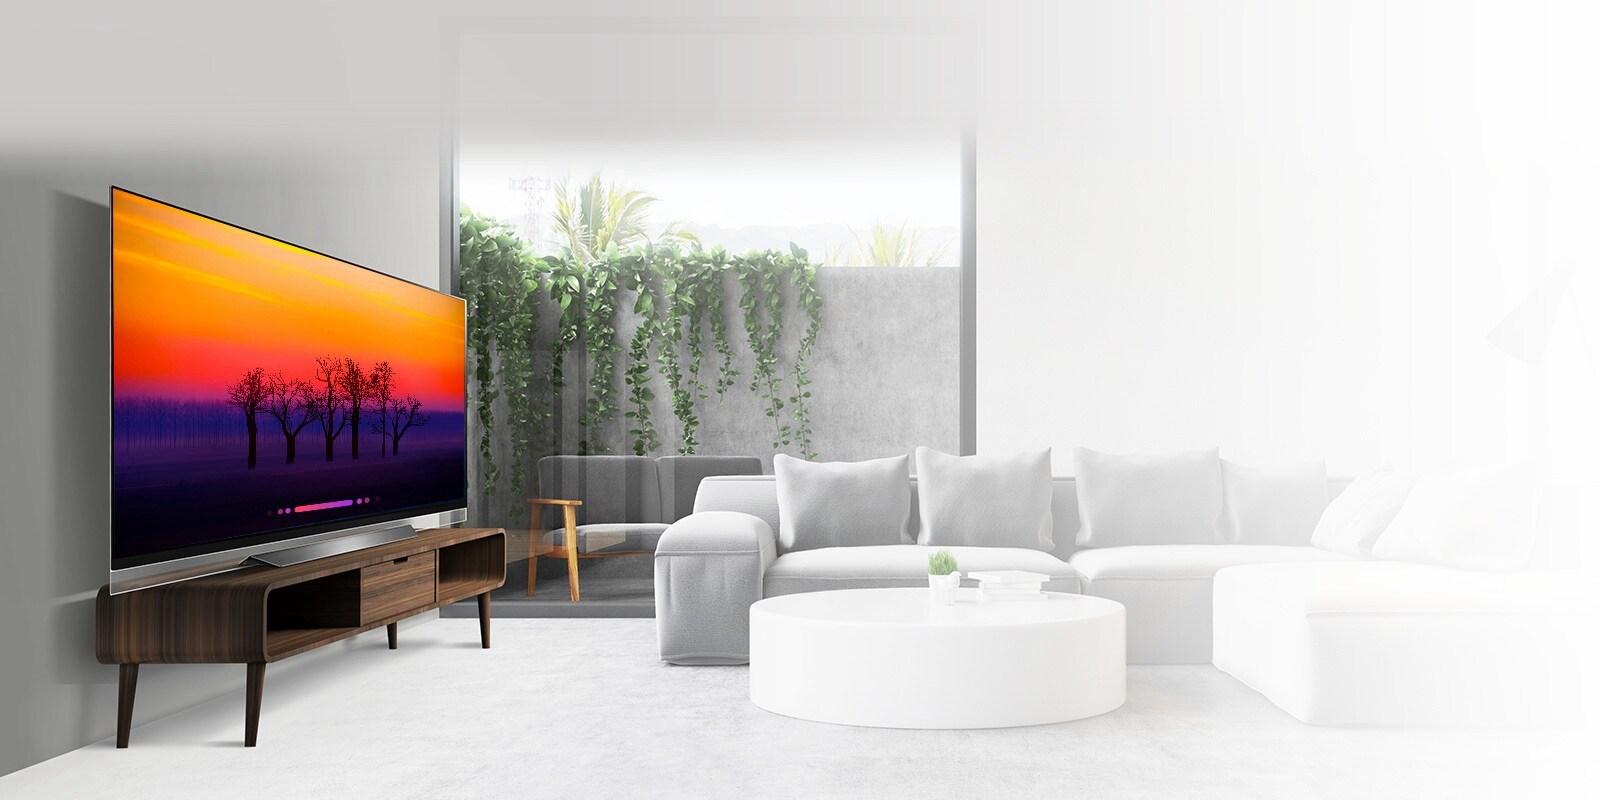 TV & Home Theatre. The Ultimate Audio-Visual Experience | LG Australia